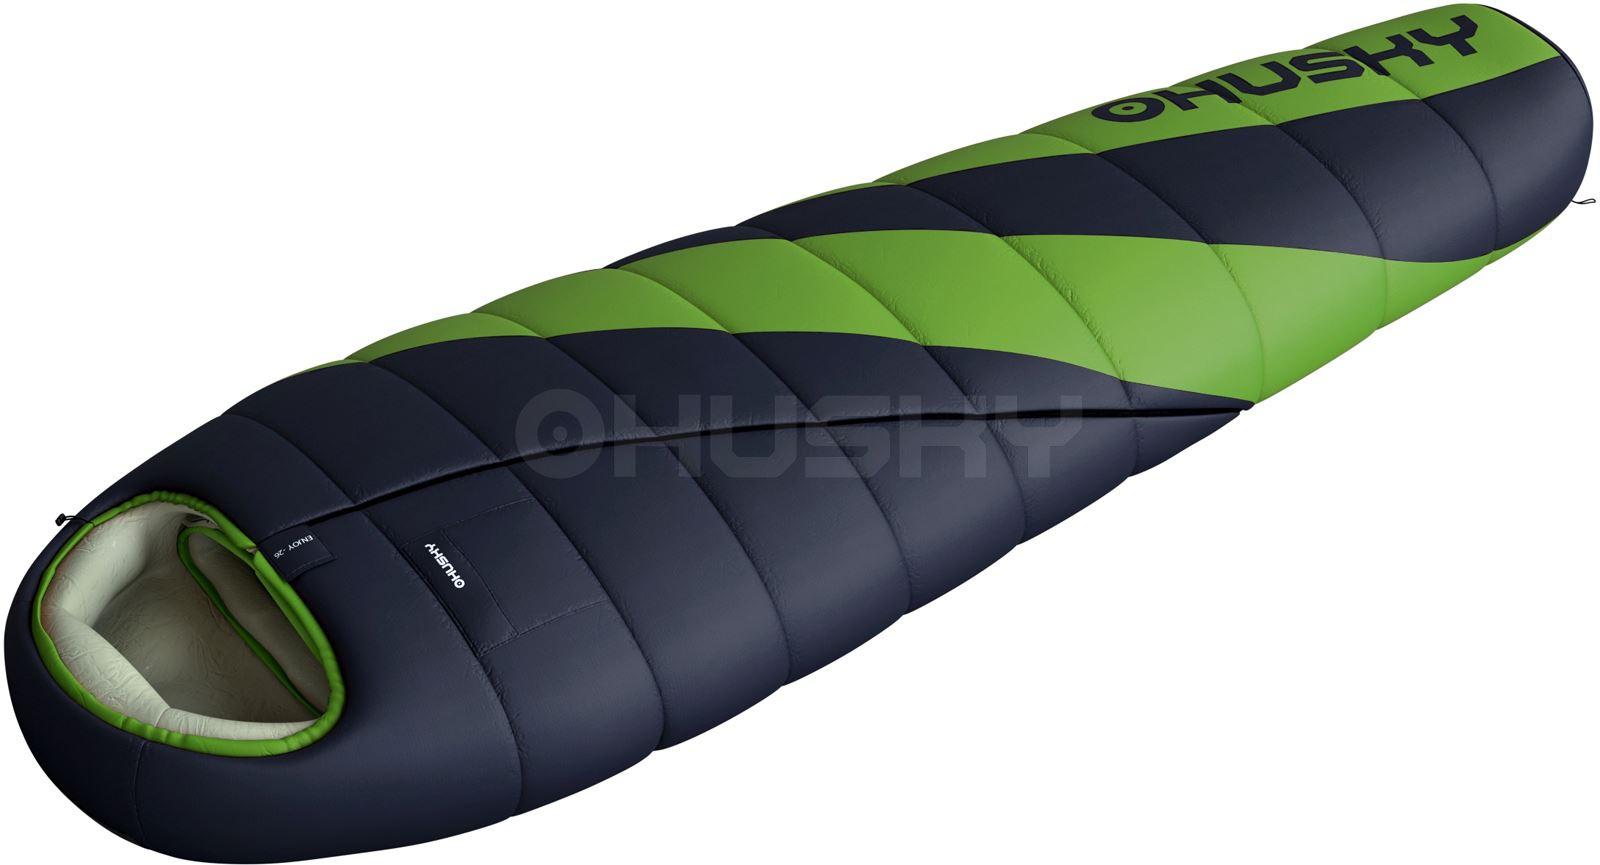 018357a117 Husky Spacák Extreme Espace -6°C zelená